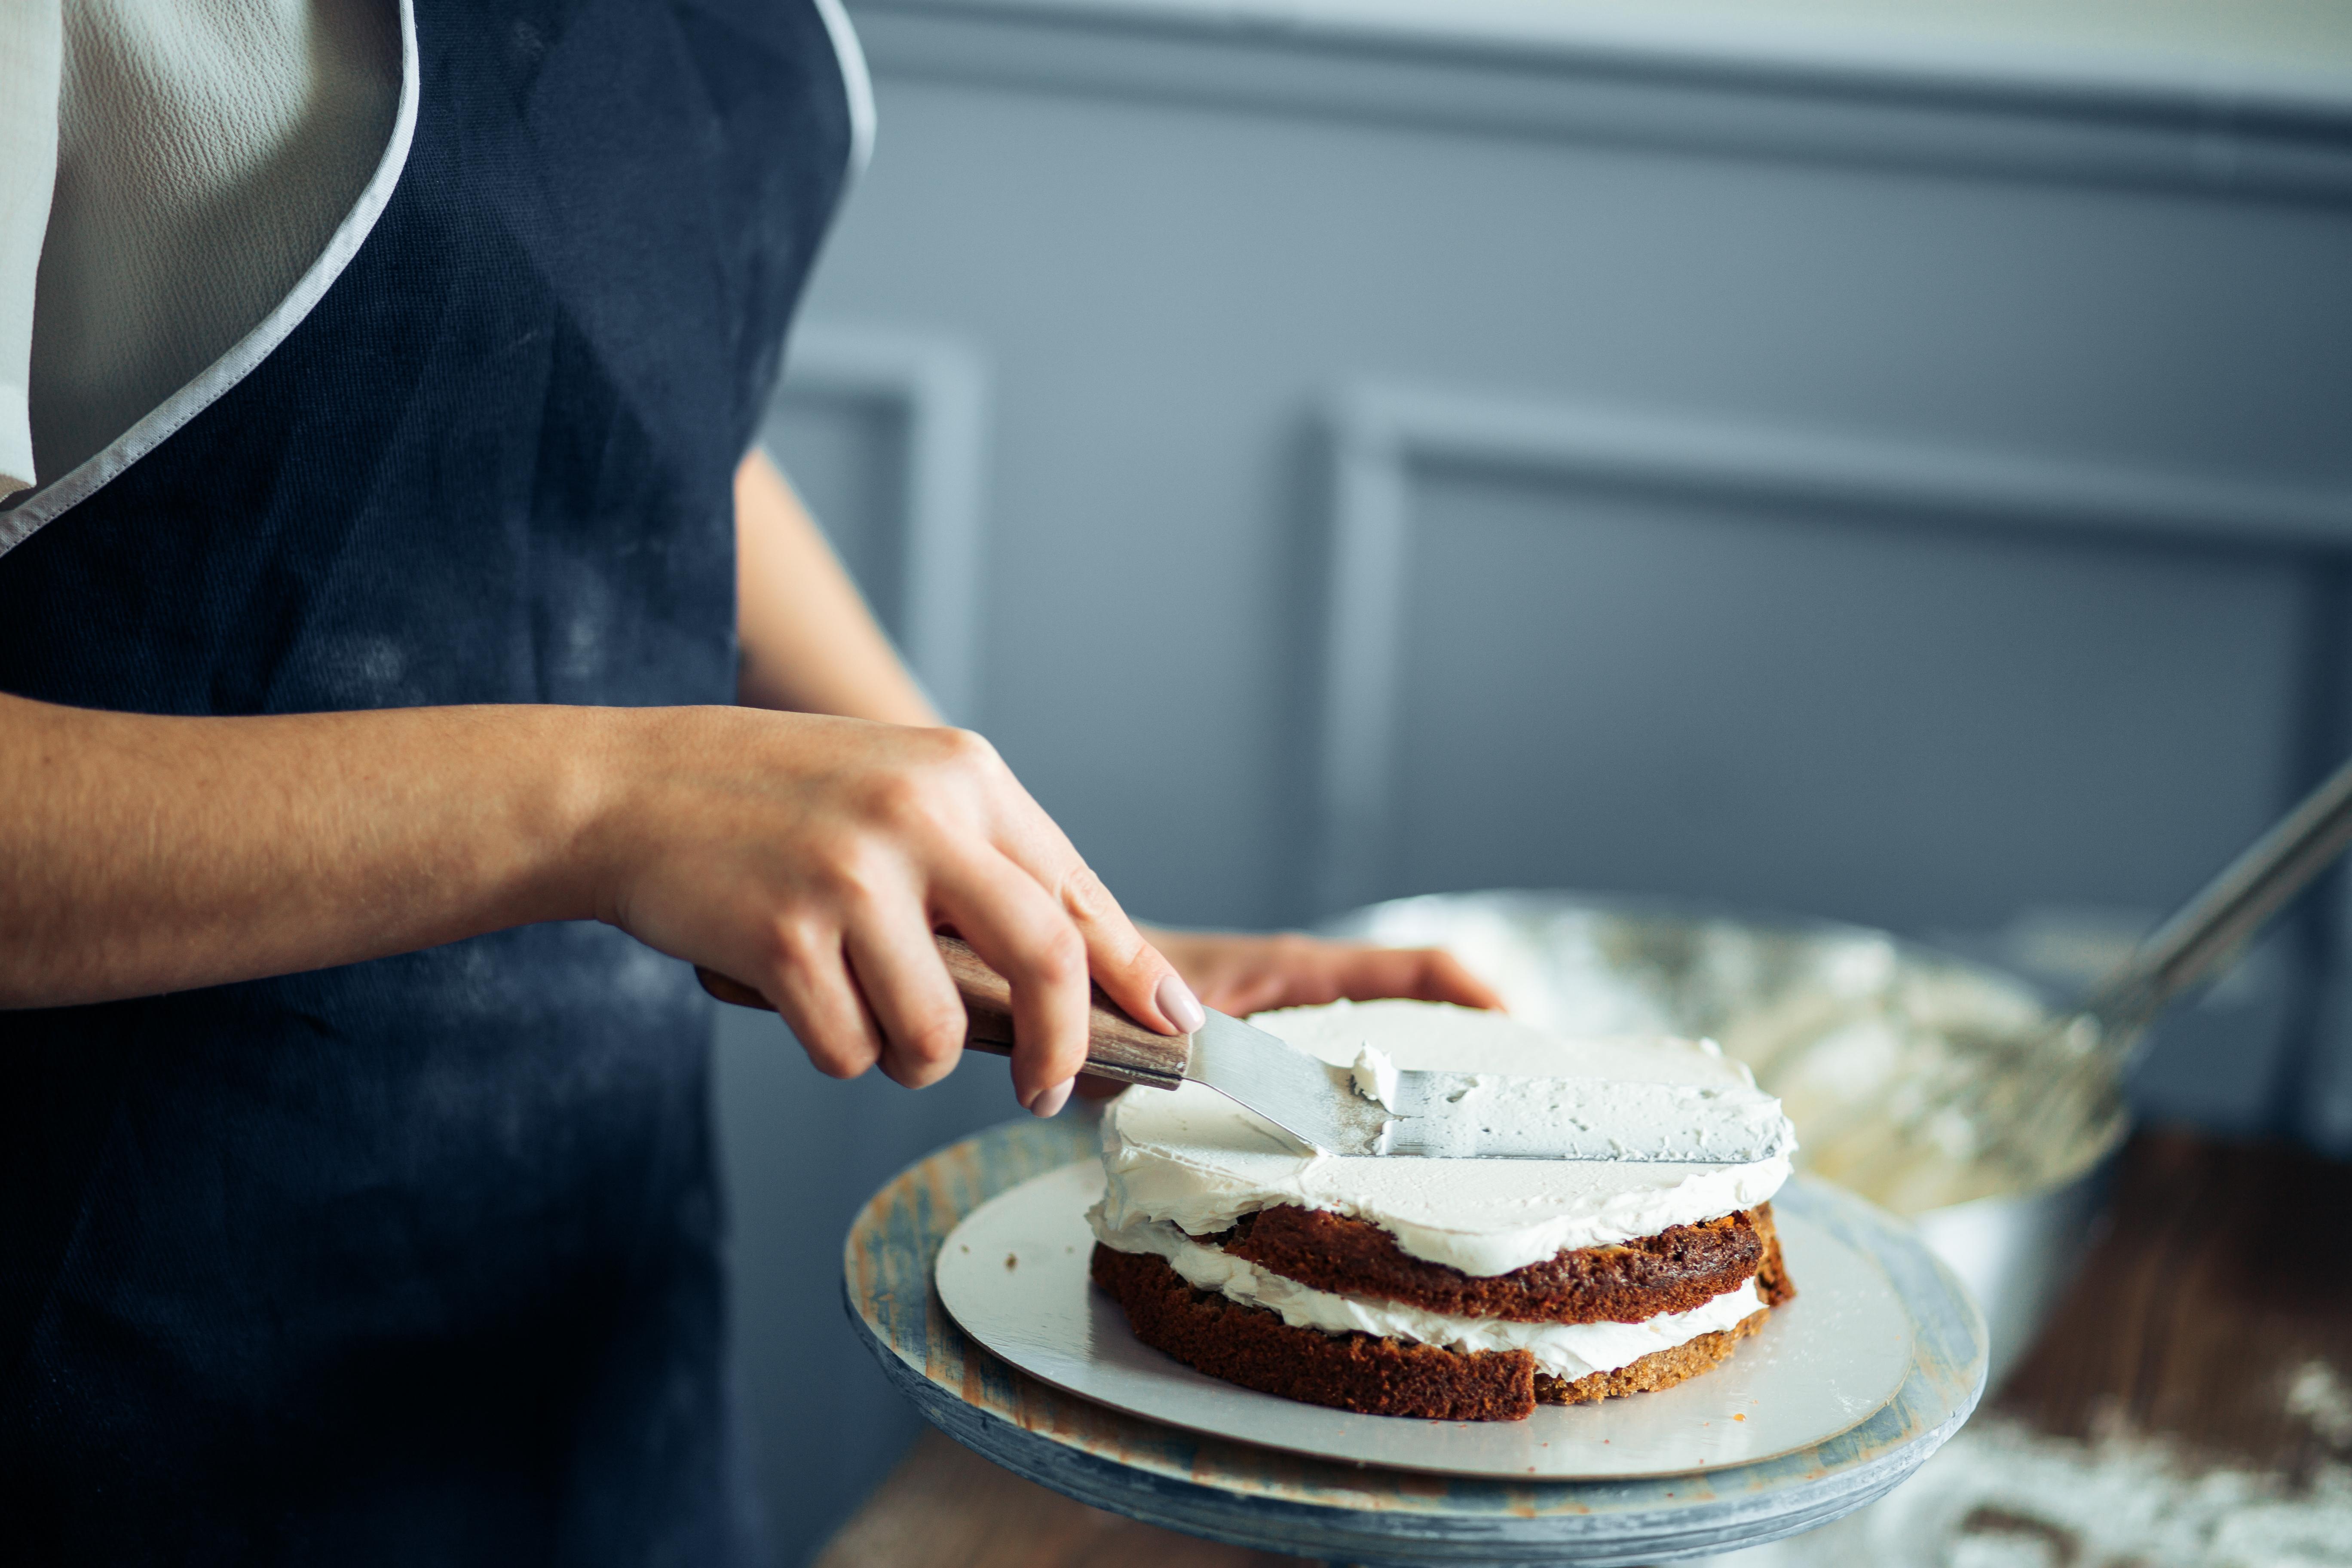 icing, cake